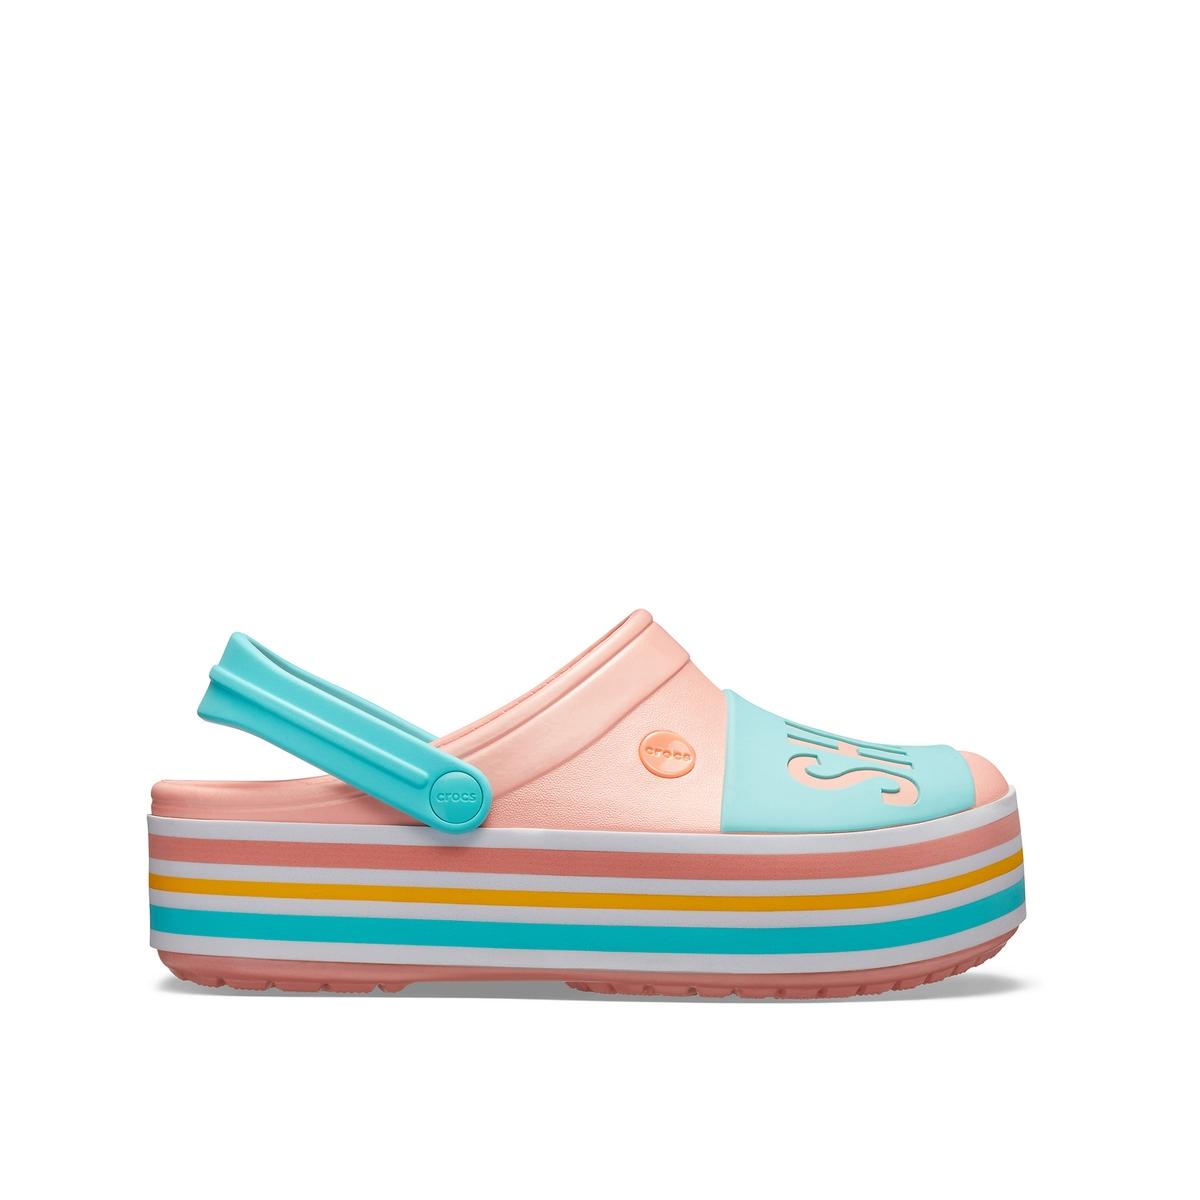 цена Туфли La Redoute Без задника PLATFORM BOLD COLOR CLOG 36/37 синий онлайн в 2017 году